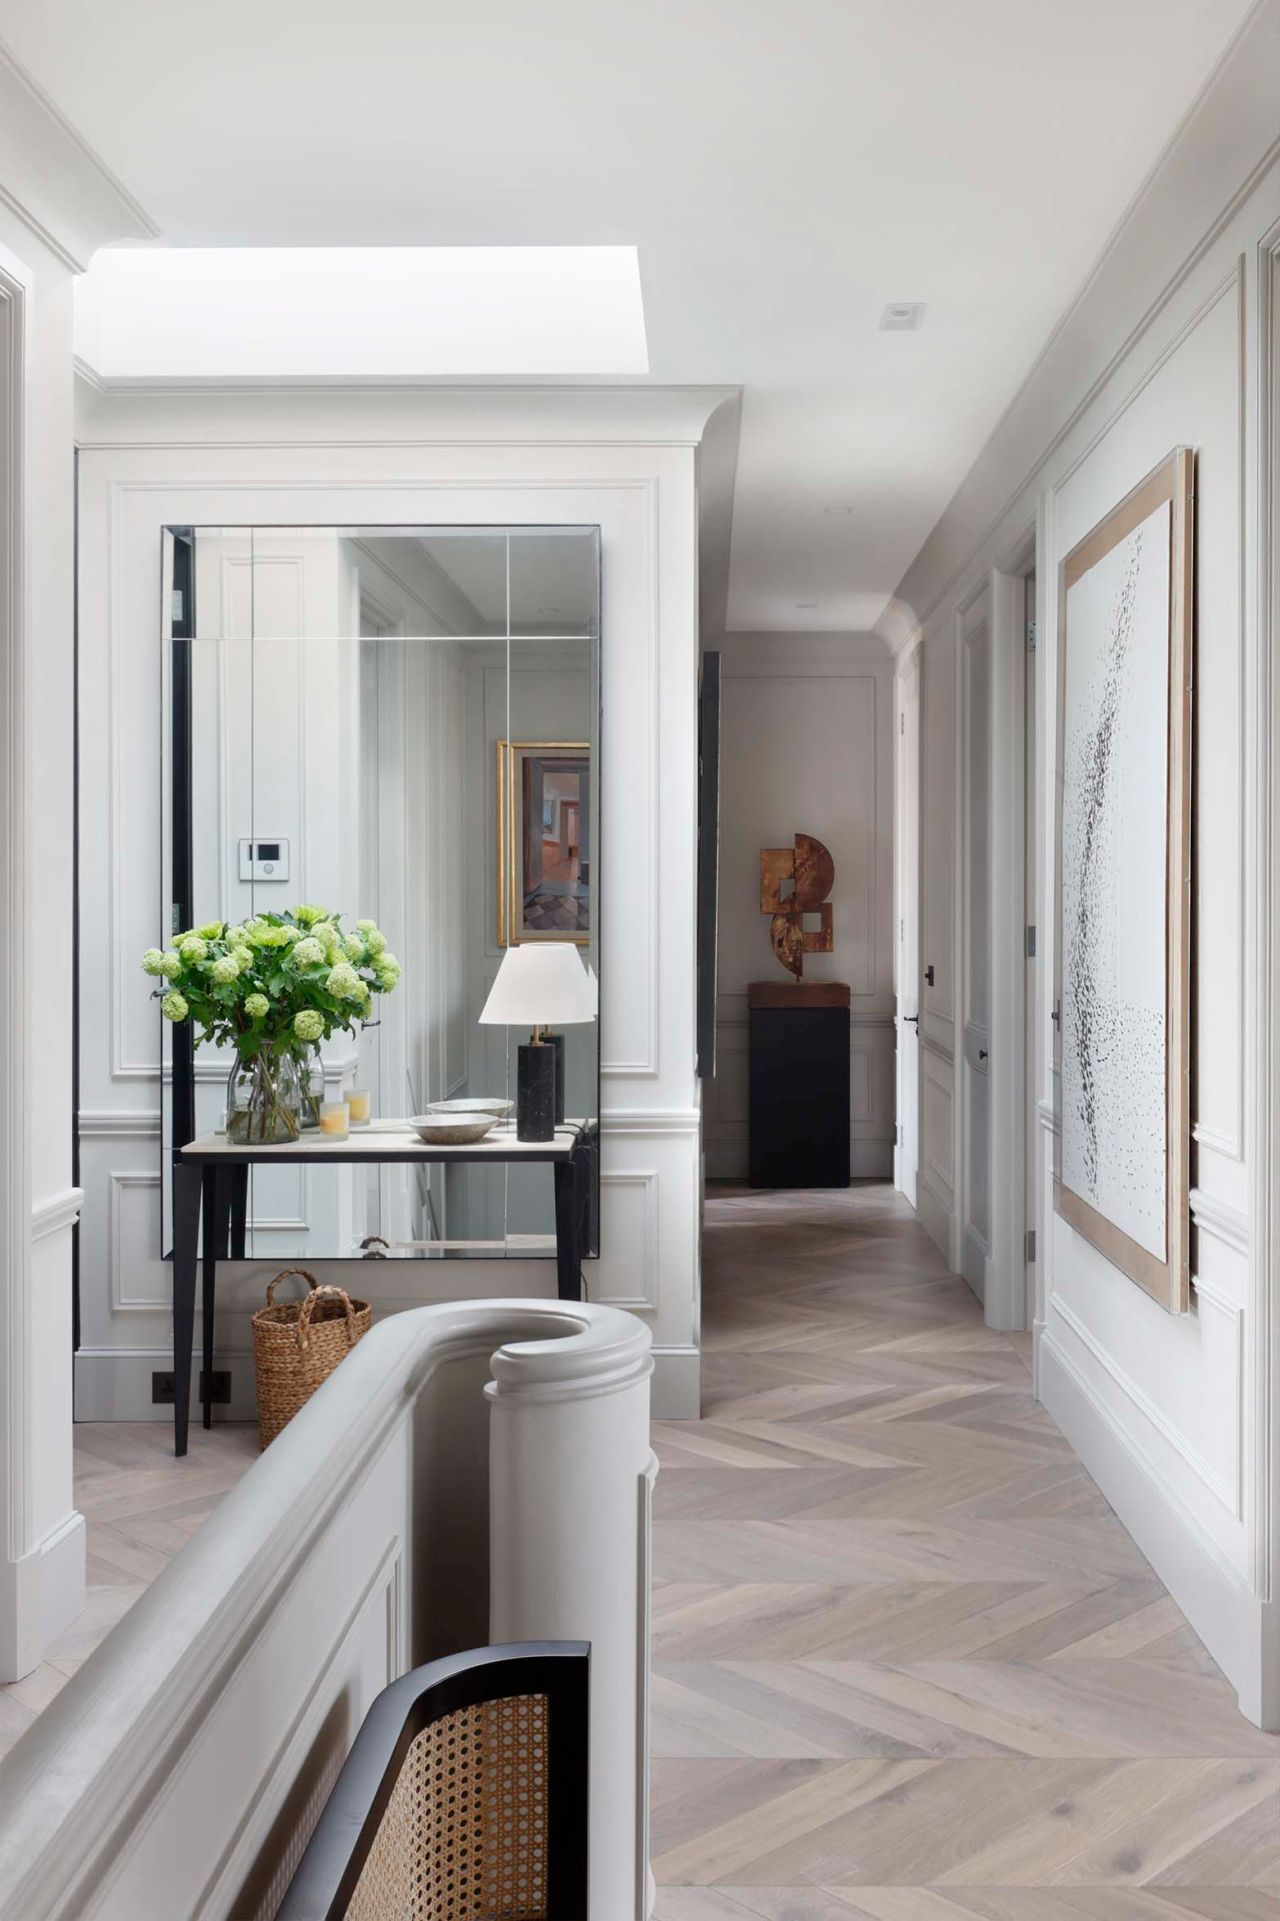 Alexander james scandinavian interior design scandinavian interior